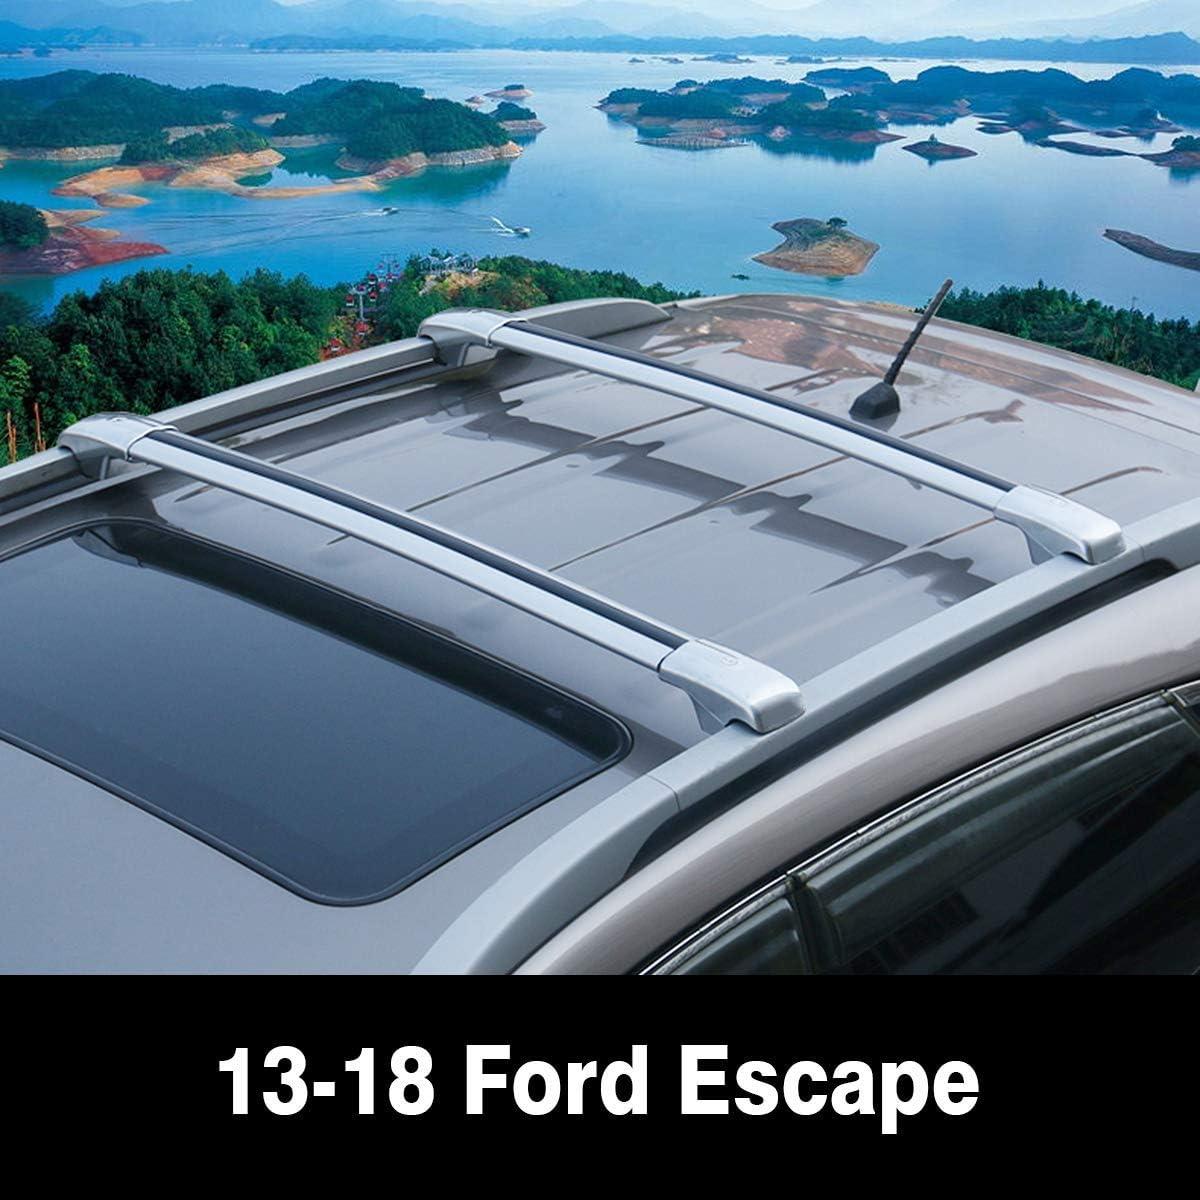 Autoxrun 2 Pcs Crossbars Fit 2015-2018 Ford Escape Kuga Lockable Baggage Luggage Racks Roof Racks Rail Cross Bar